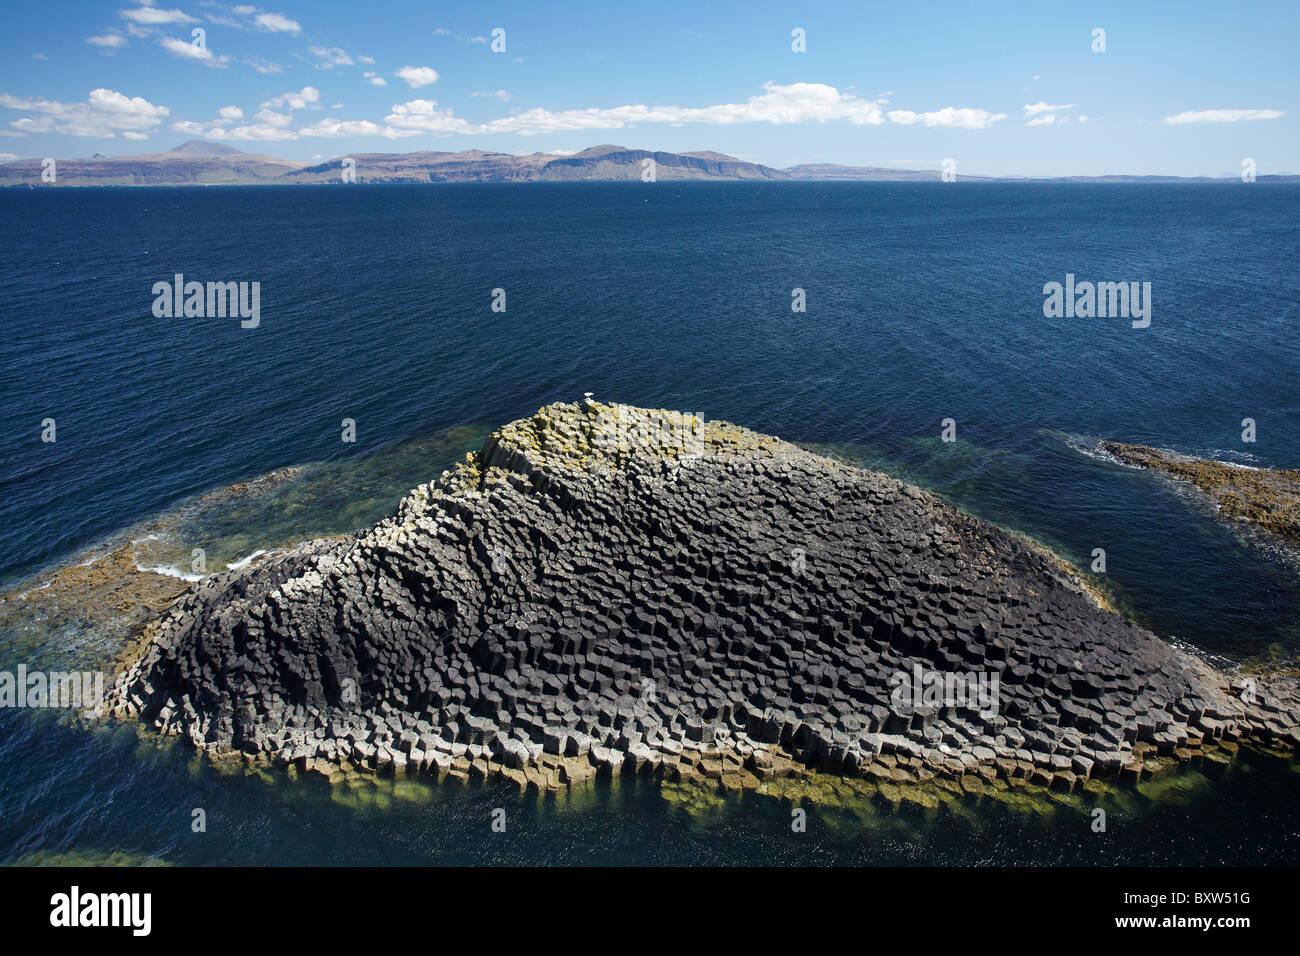 Polygonal basalt, Am Buachaille rocks, Staffa, off Isle of Mull (in distance), Scotland, United Kingdom Stock Photo